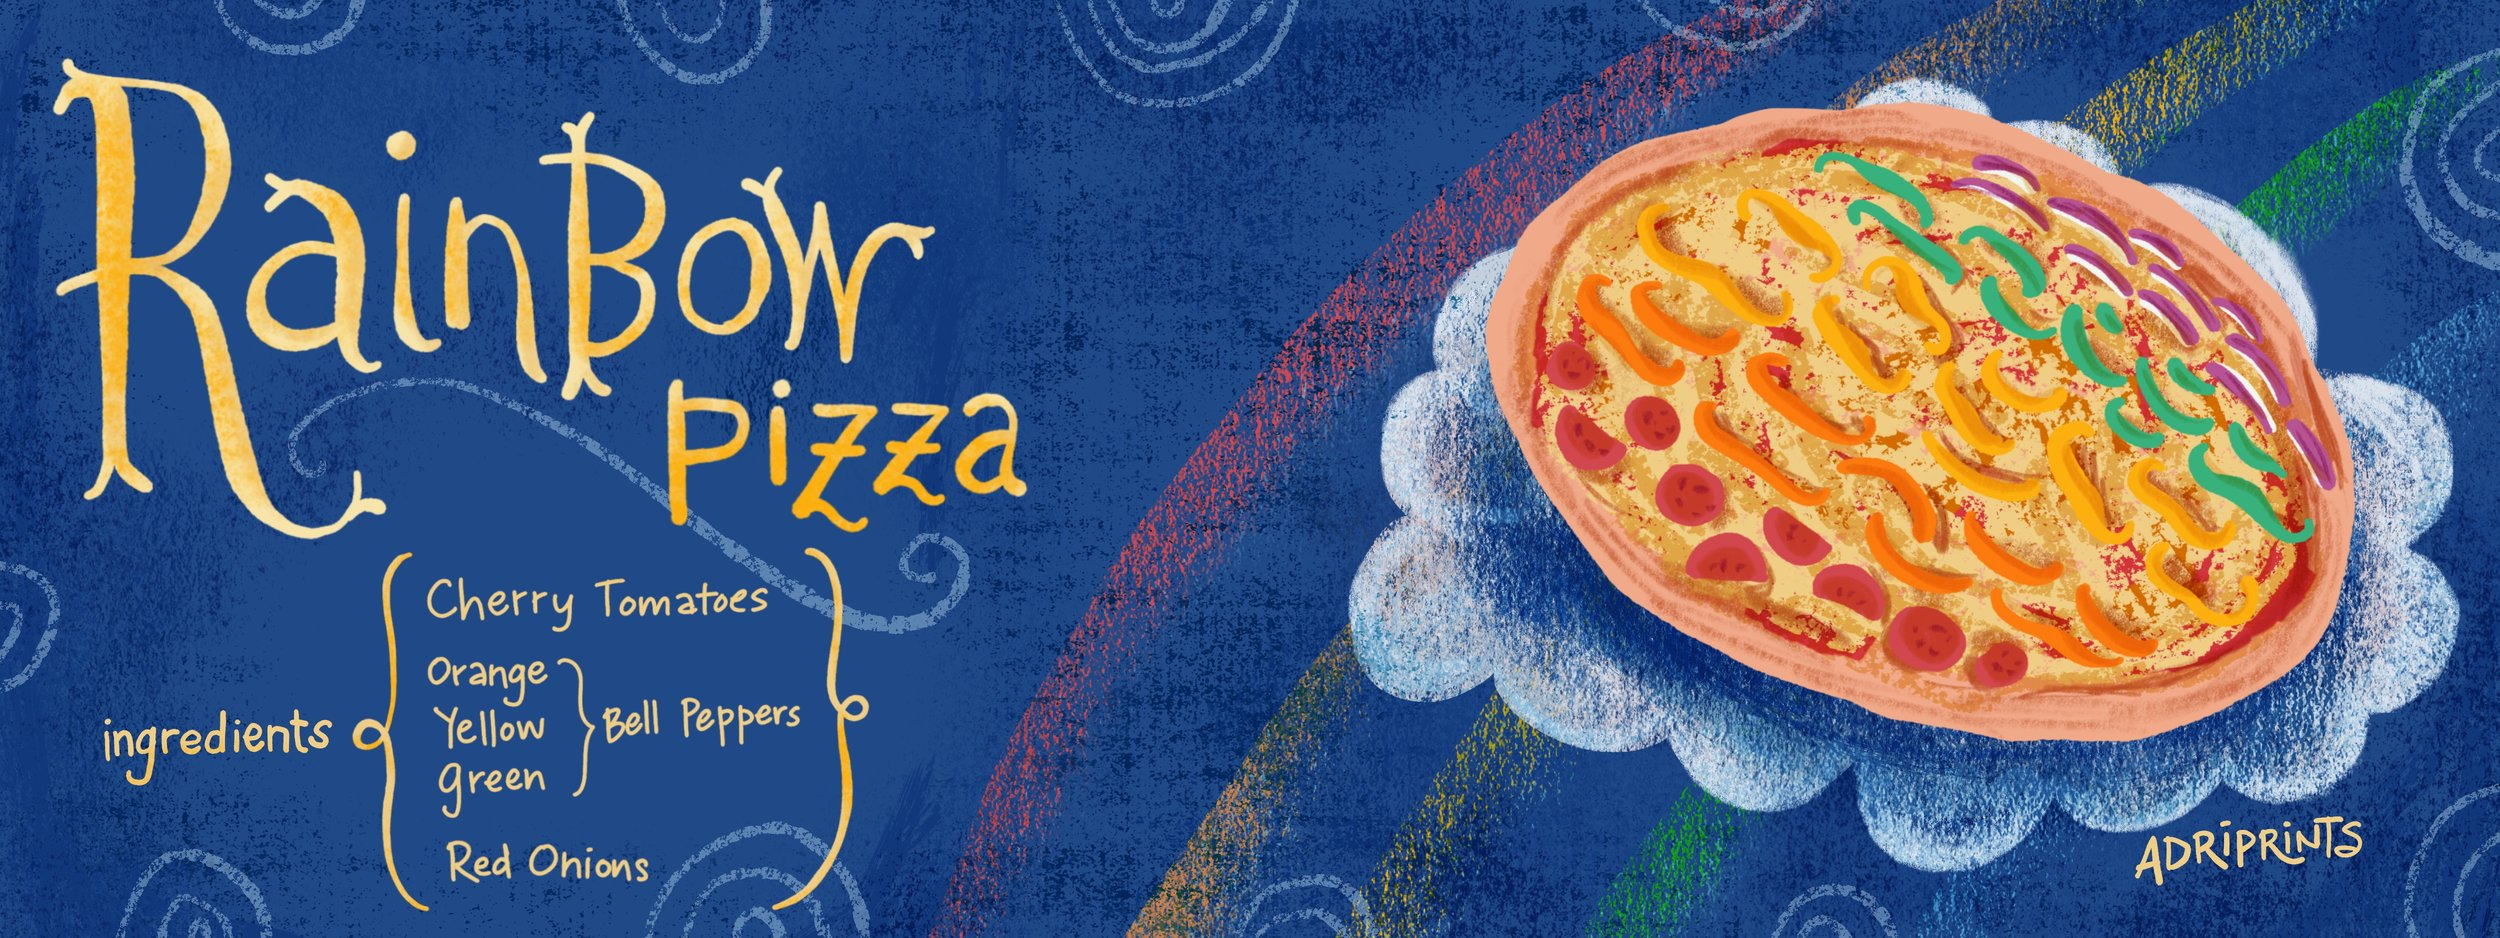 rainbow-pizza2.jpg